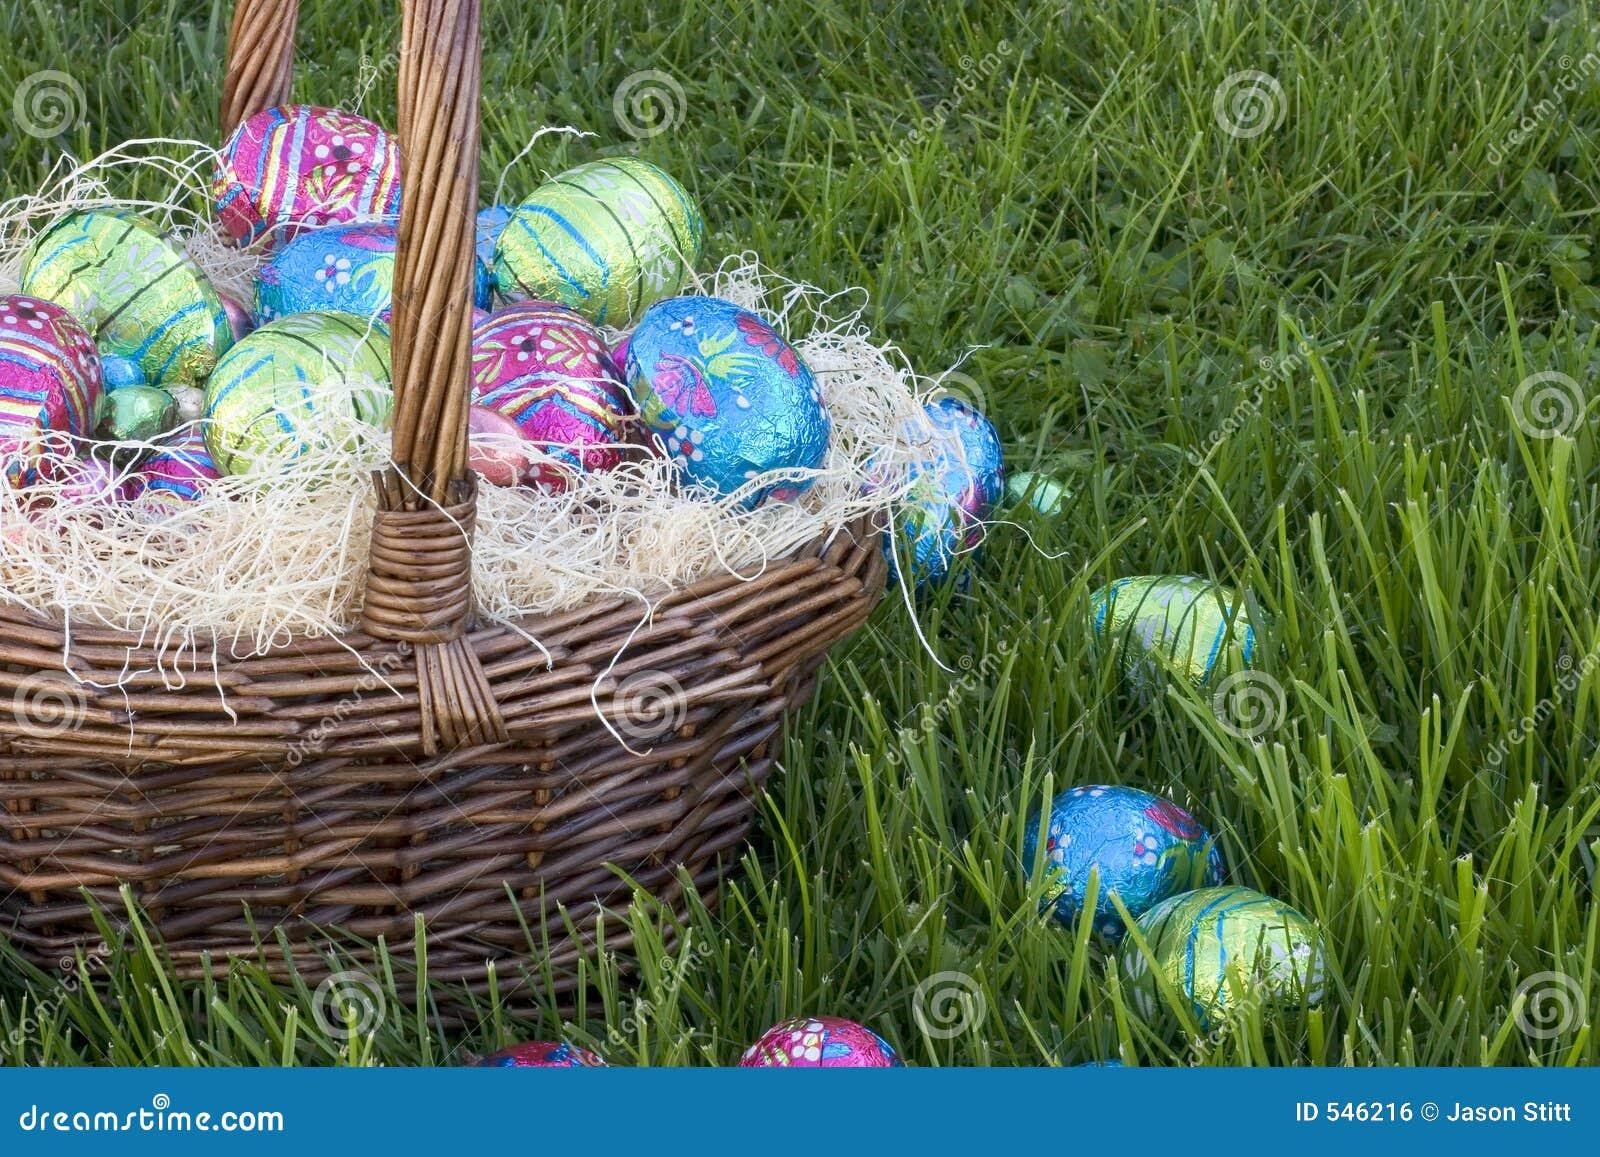 Download 复活节彩蛋 库存照片. 图片 包括有 分批, 颜色, 搜索, 鸡蛋, 五颜六色, 复活节, 节假日, 春天, bataan - 546216